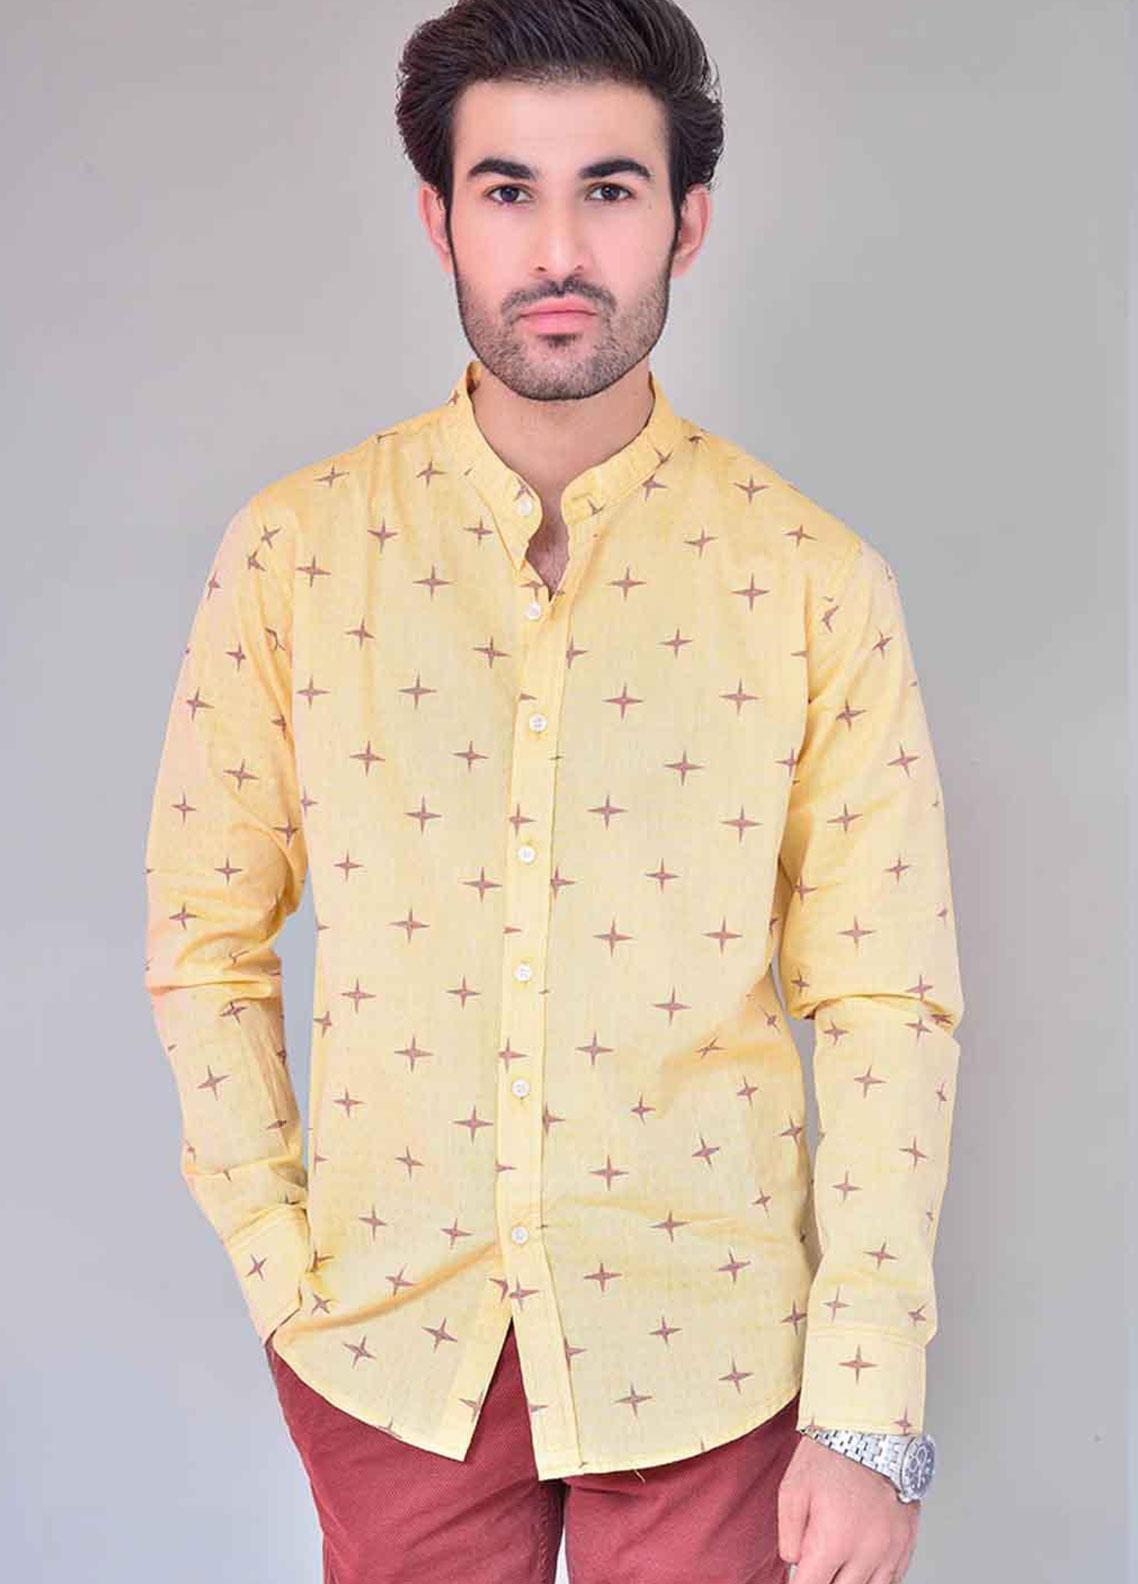 Ignite Wardrobe Cotton Twinkling Stars Printed Shirts for Men -  IG20SHM 029